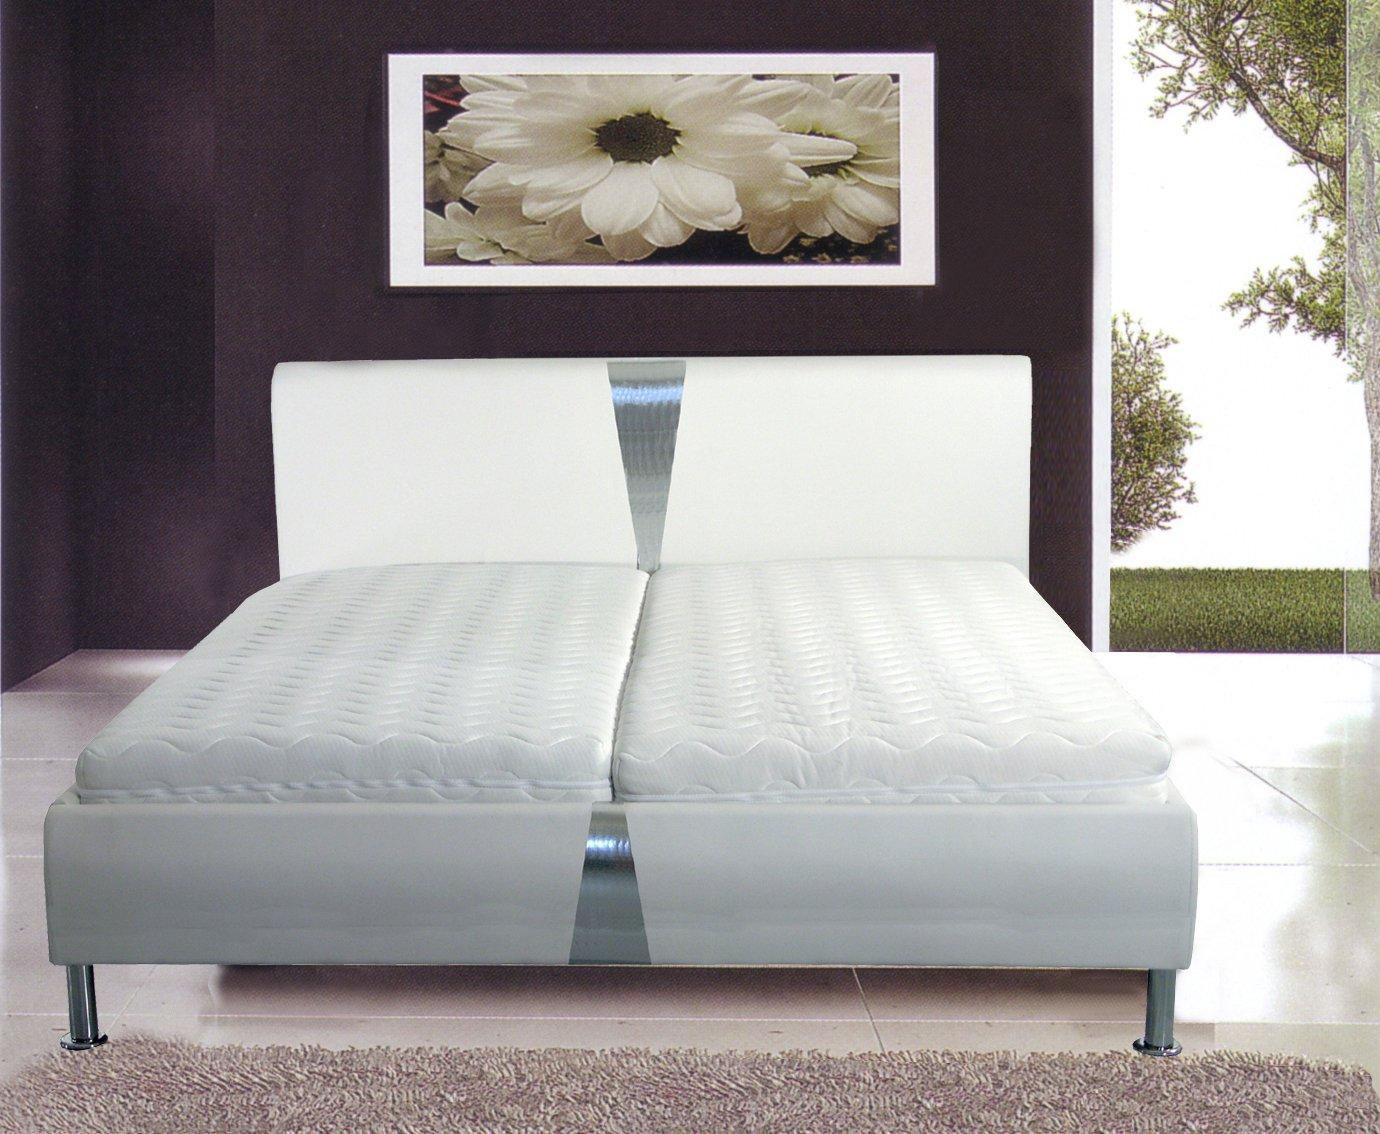 Design Bett Nizza+. Posterbett 180x200 cm, Bettgestell weiß ...